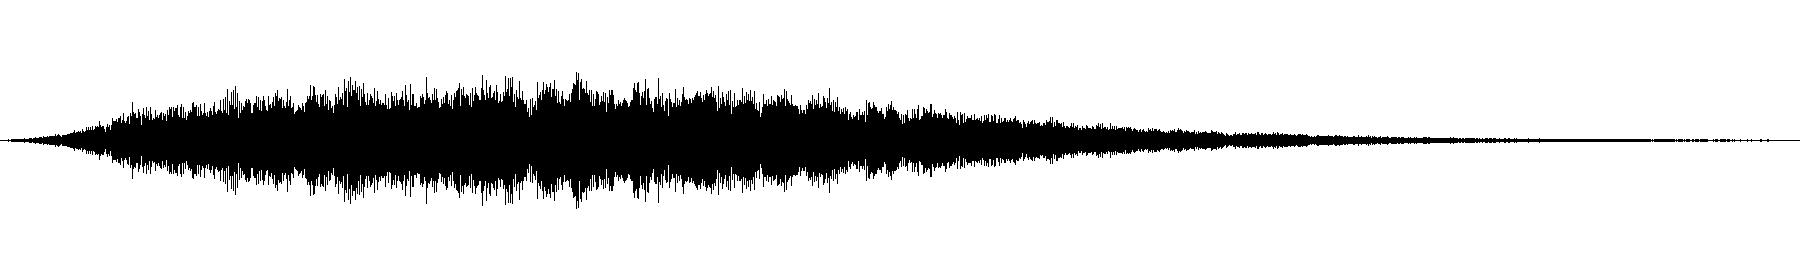 synth choir cm7